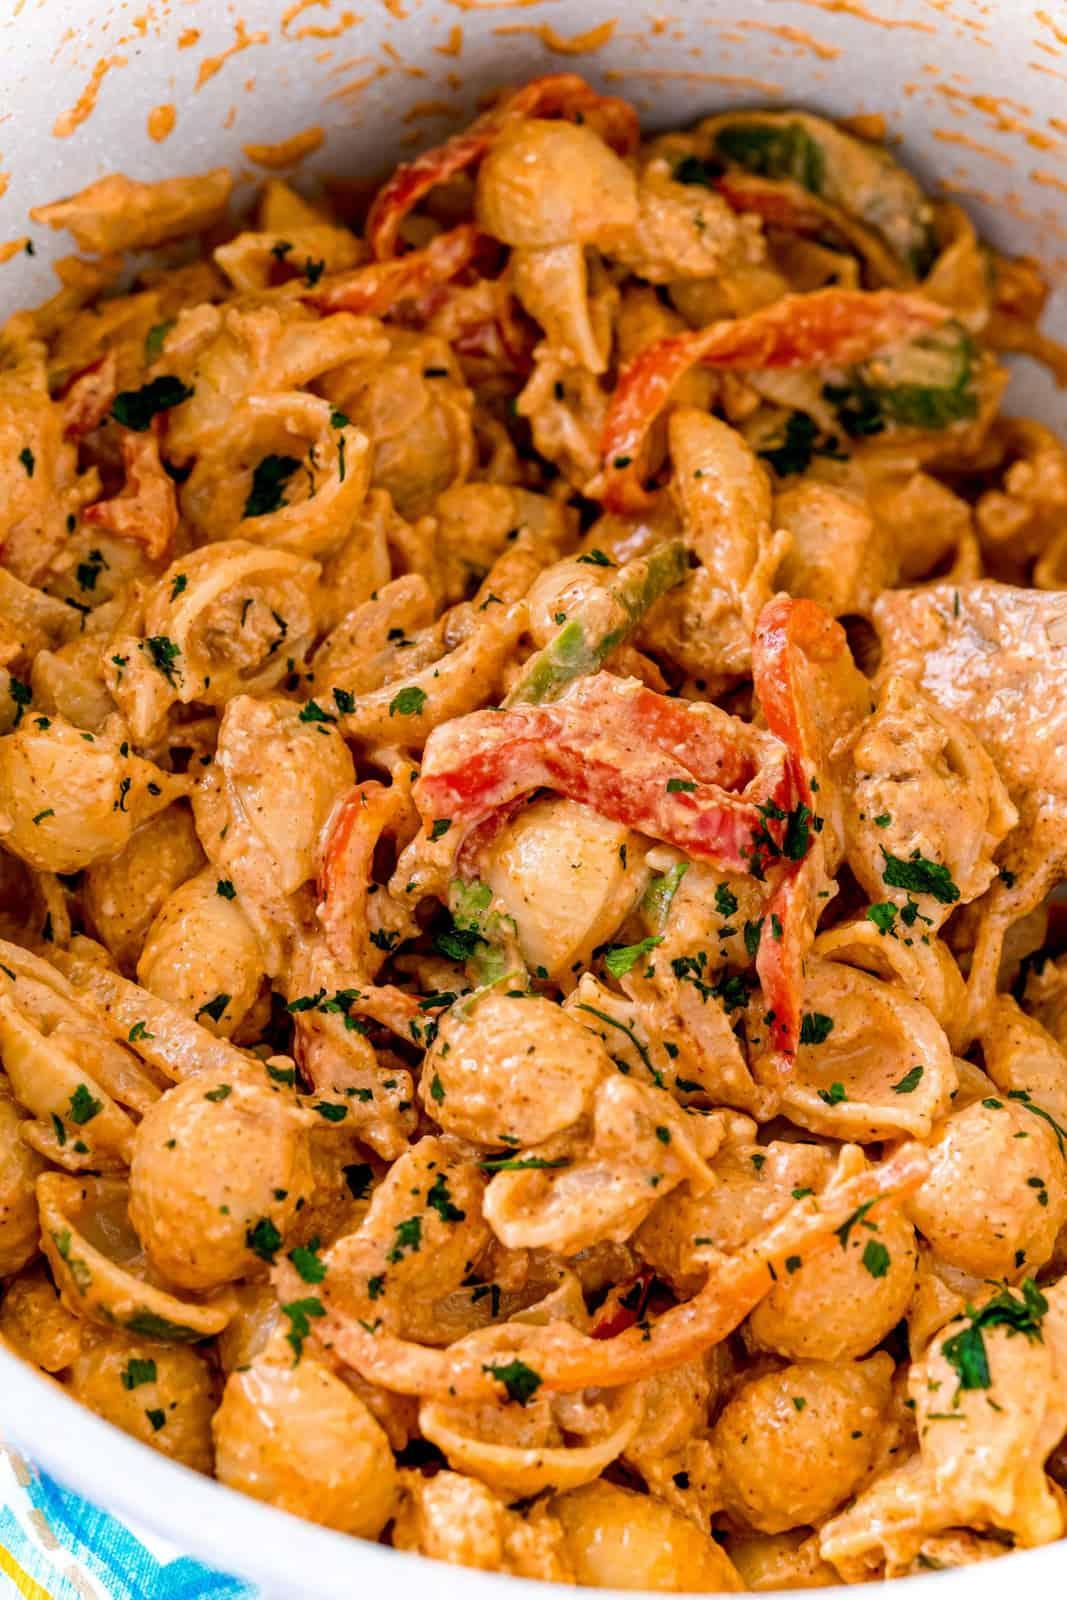 Stirred up pasta in pan